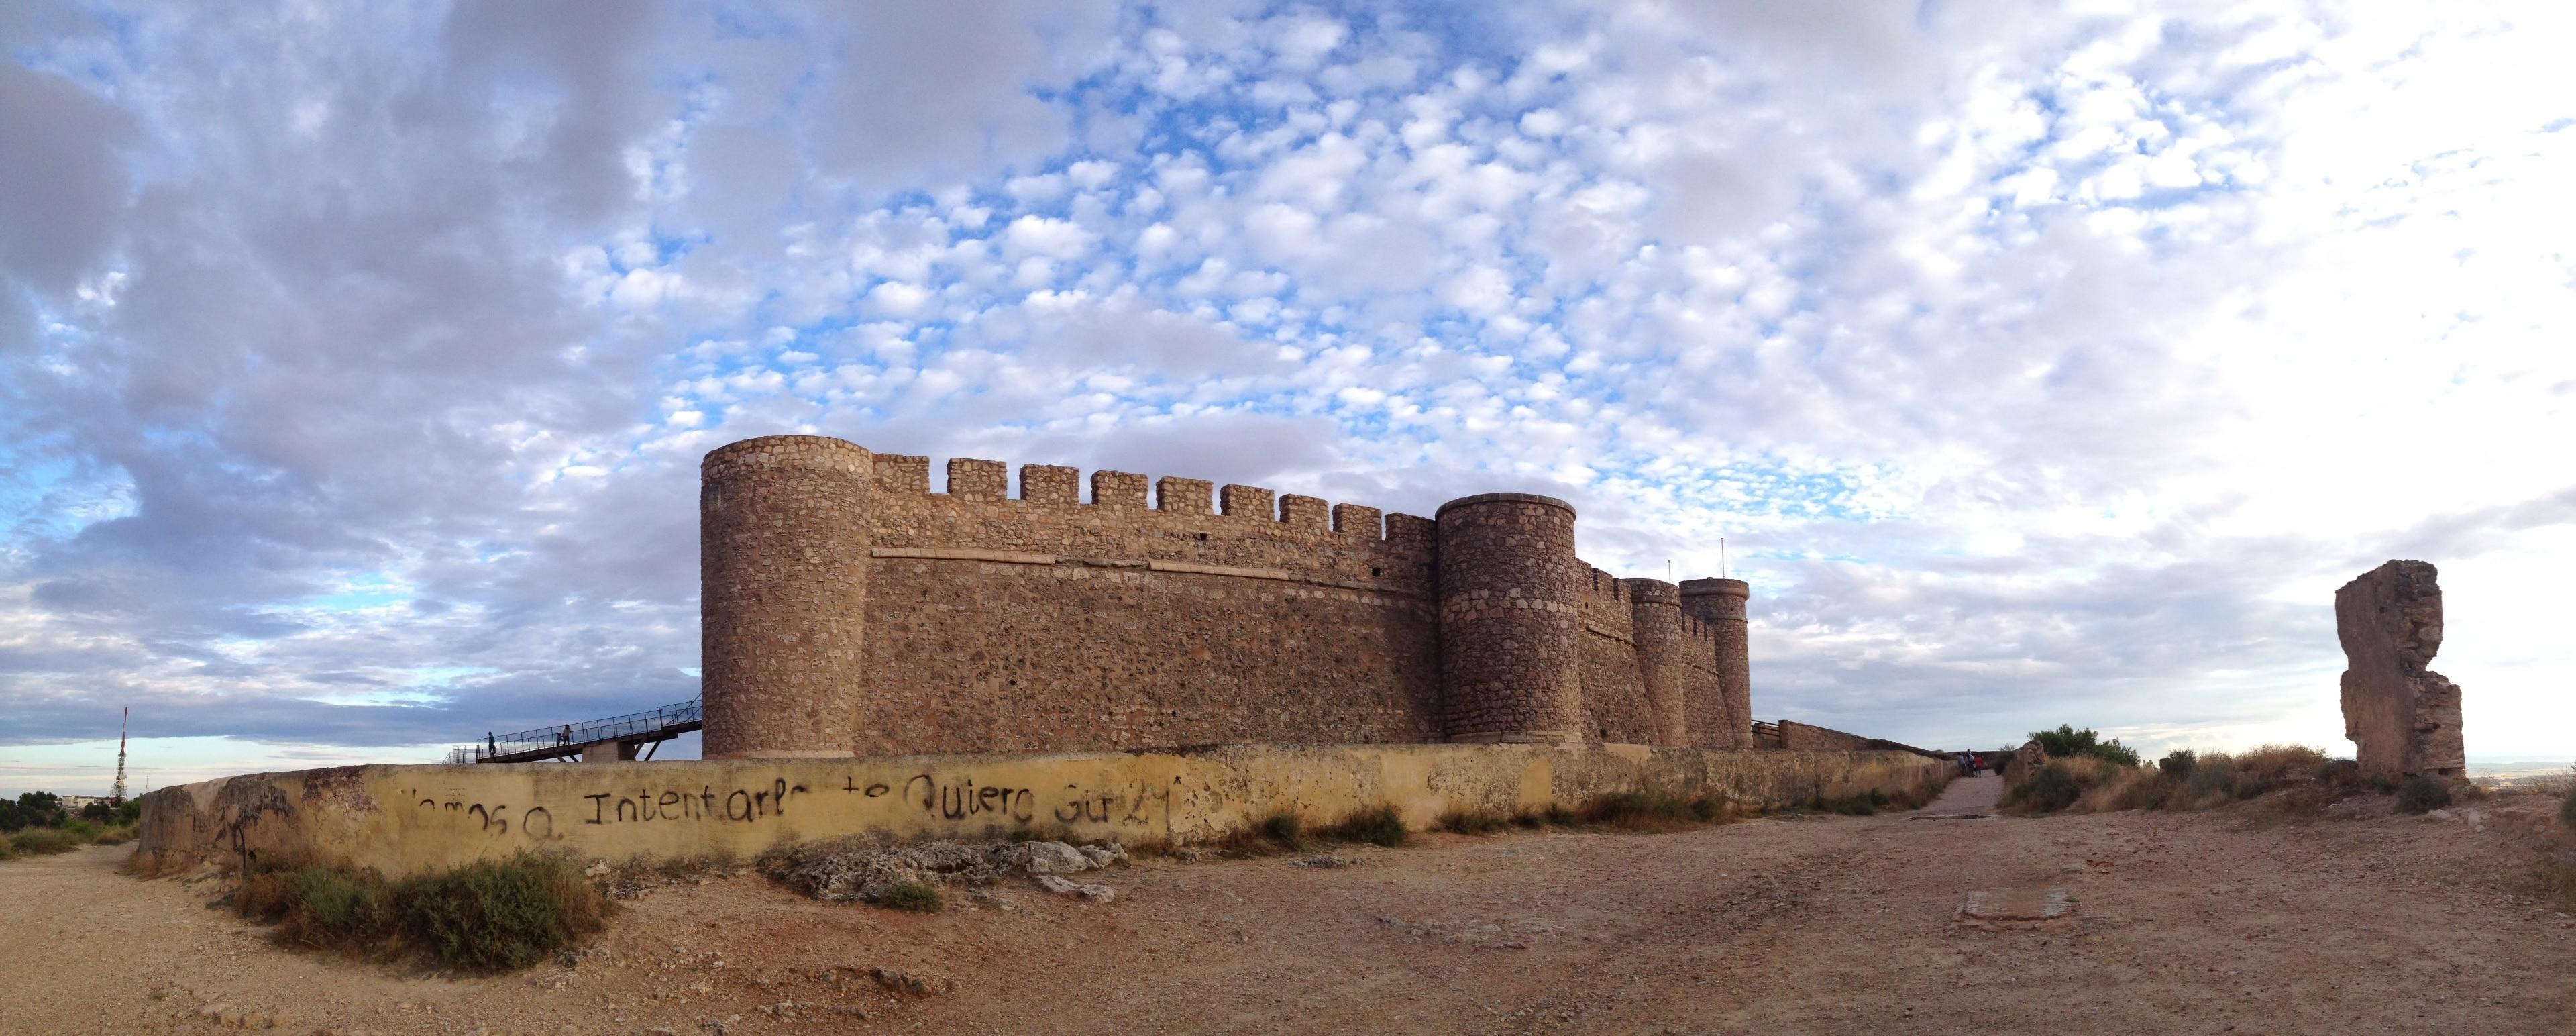 Albacete, Castilla-La Mancha, España